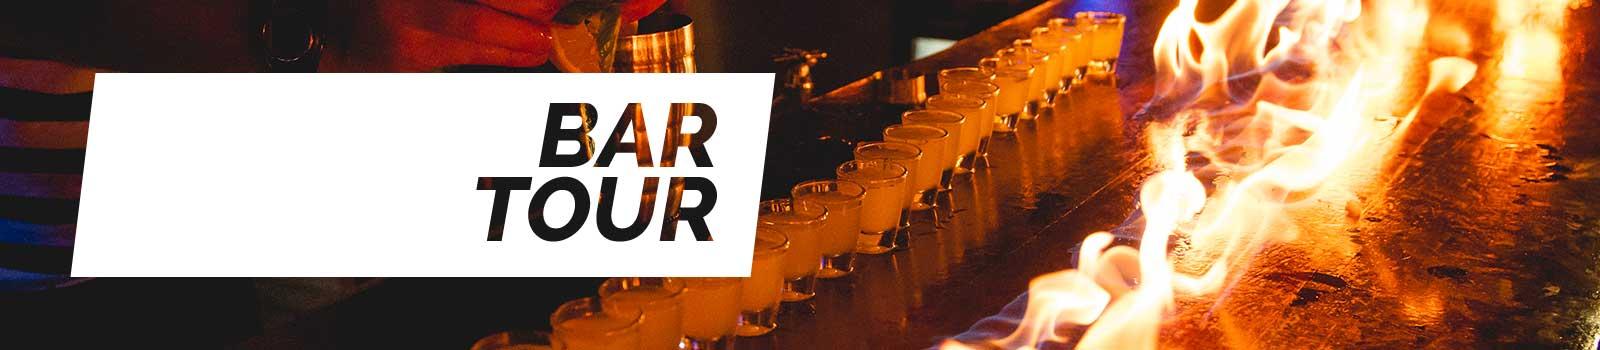 corfu-b13-bar-tour